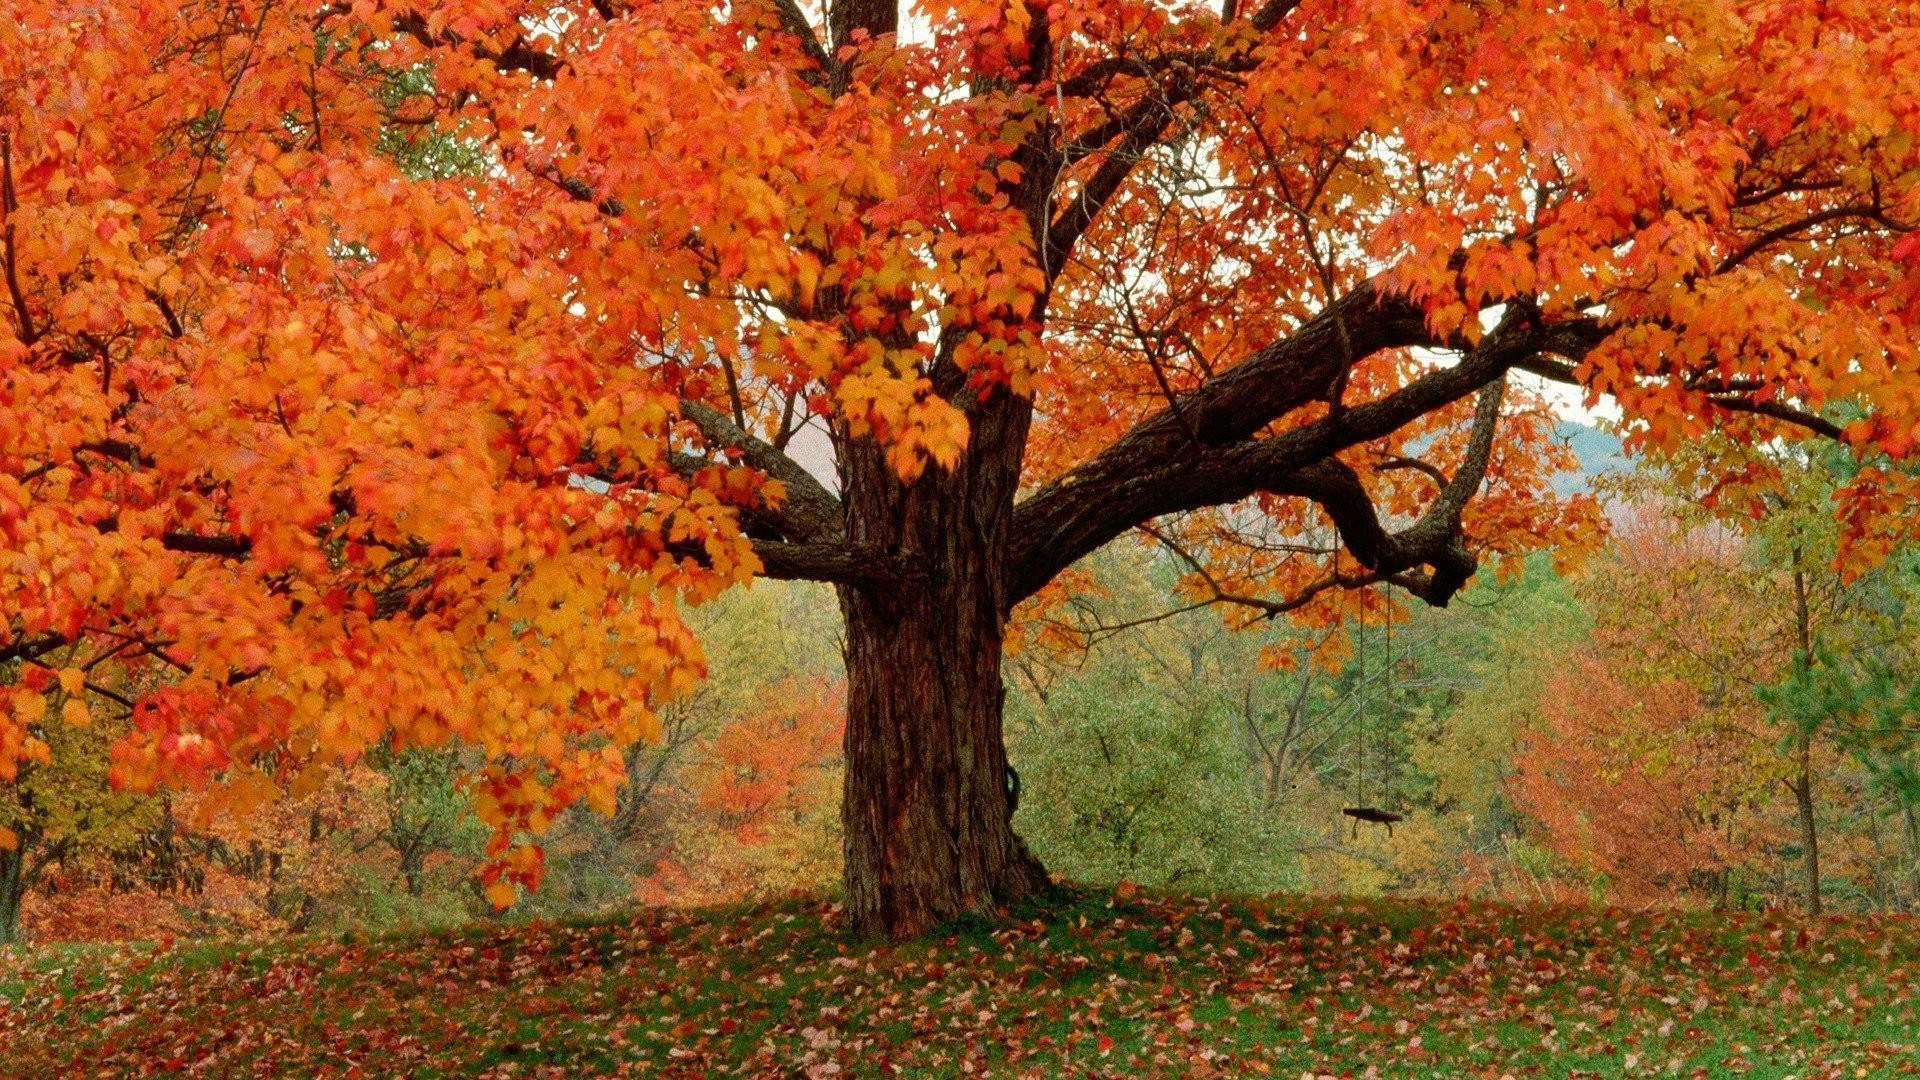 Download Autumn Wallpaper Widescreen Hd Backgrounds Download Itl Cat